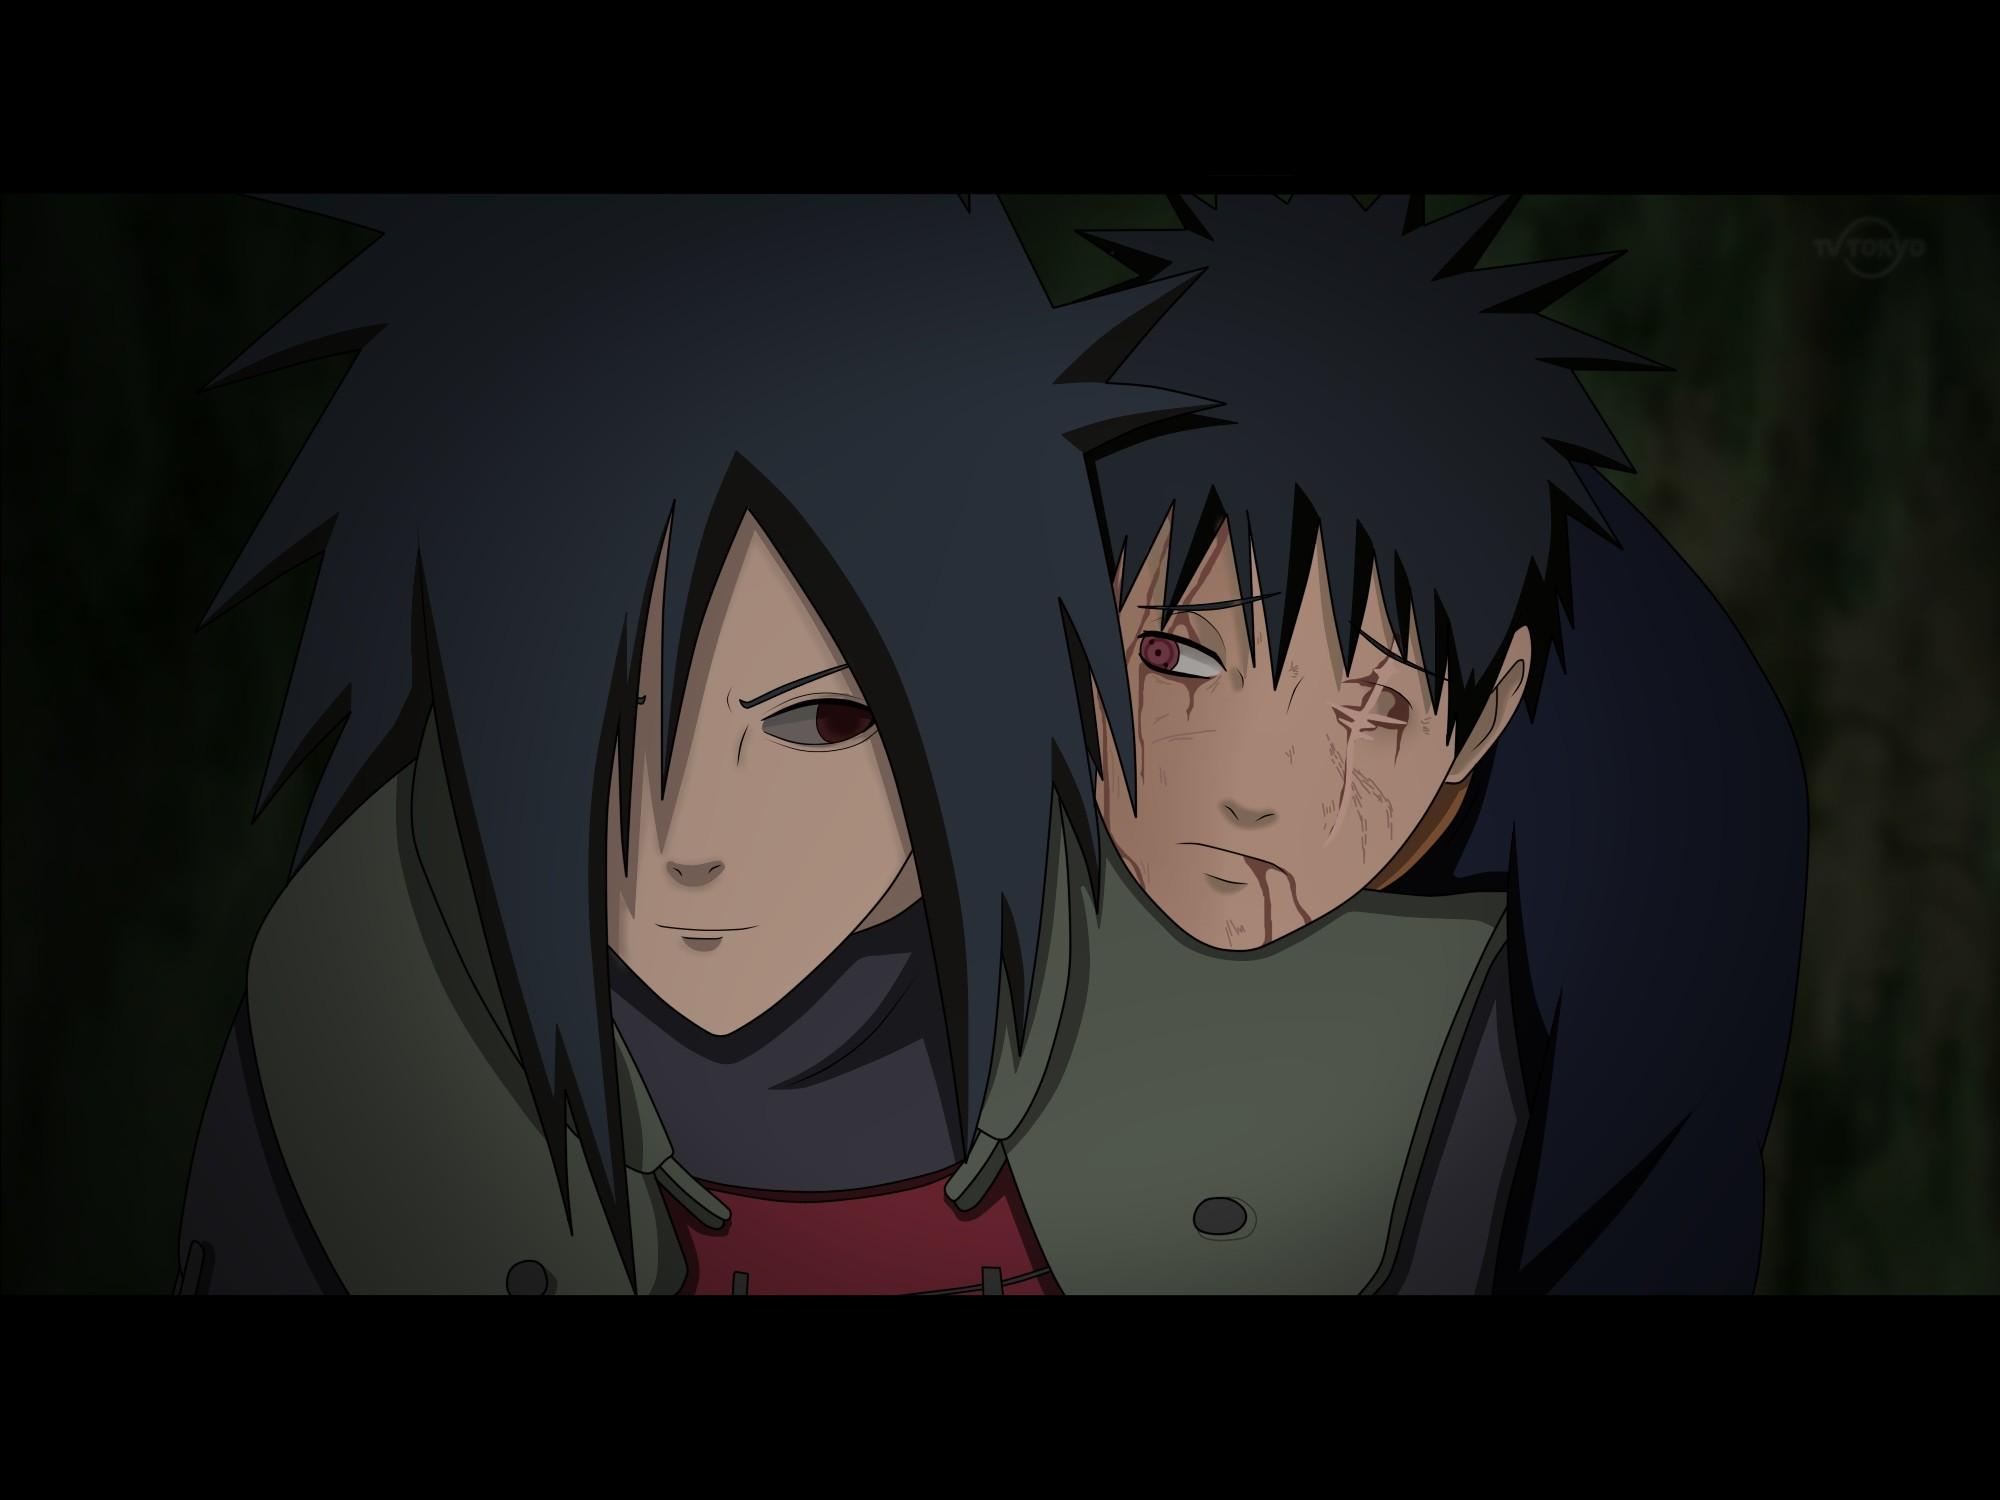 Uchiha Obito   Manga & Anime   Pinterest   Blood, Anime and Naruto